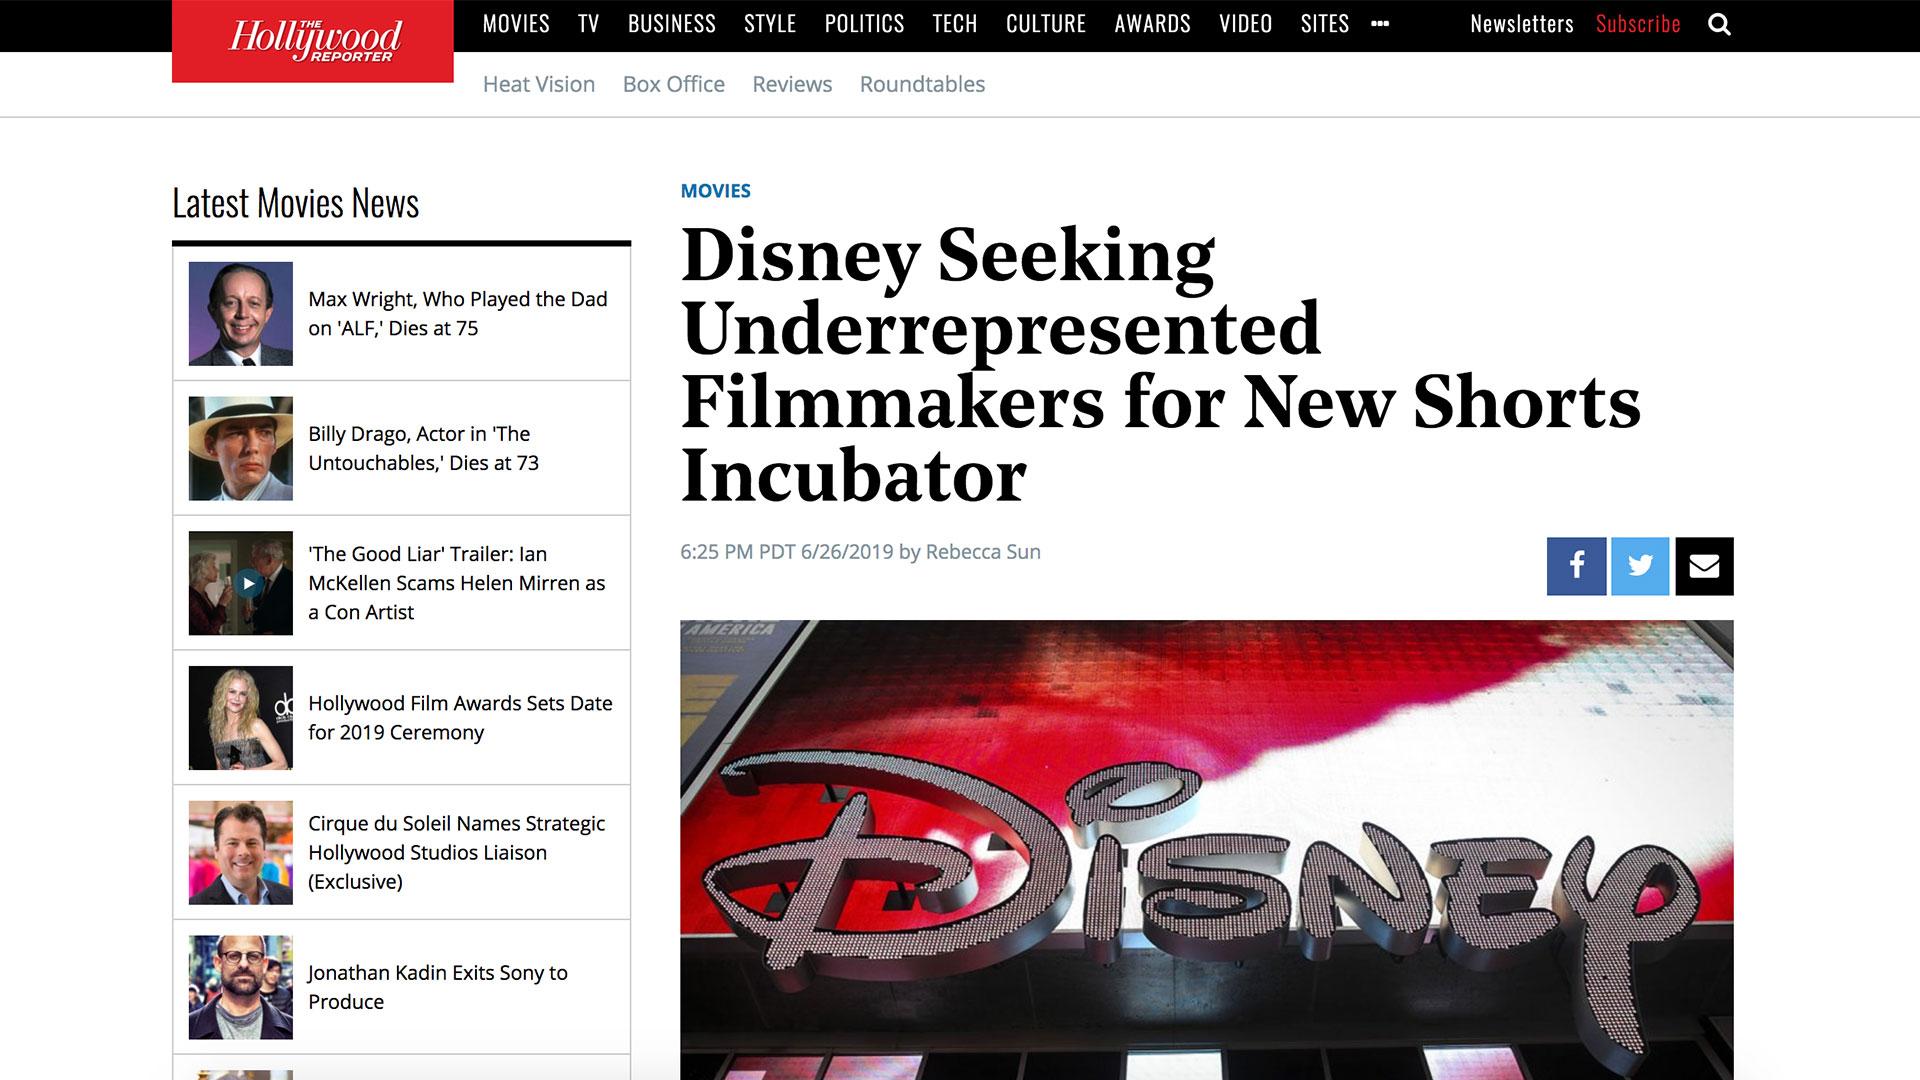 Fairness Rocks News Disney Seeking Underrepresented Filmmakers for New Shorts Incubator